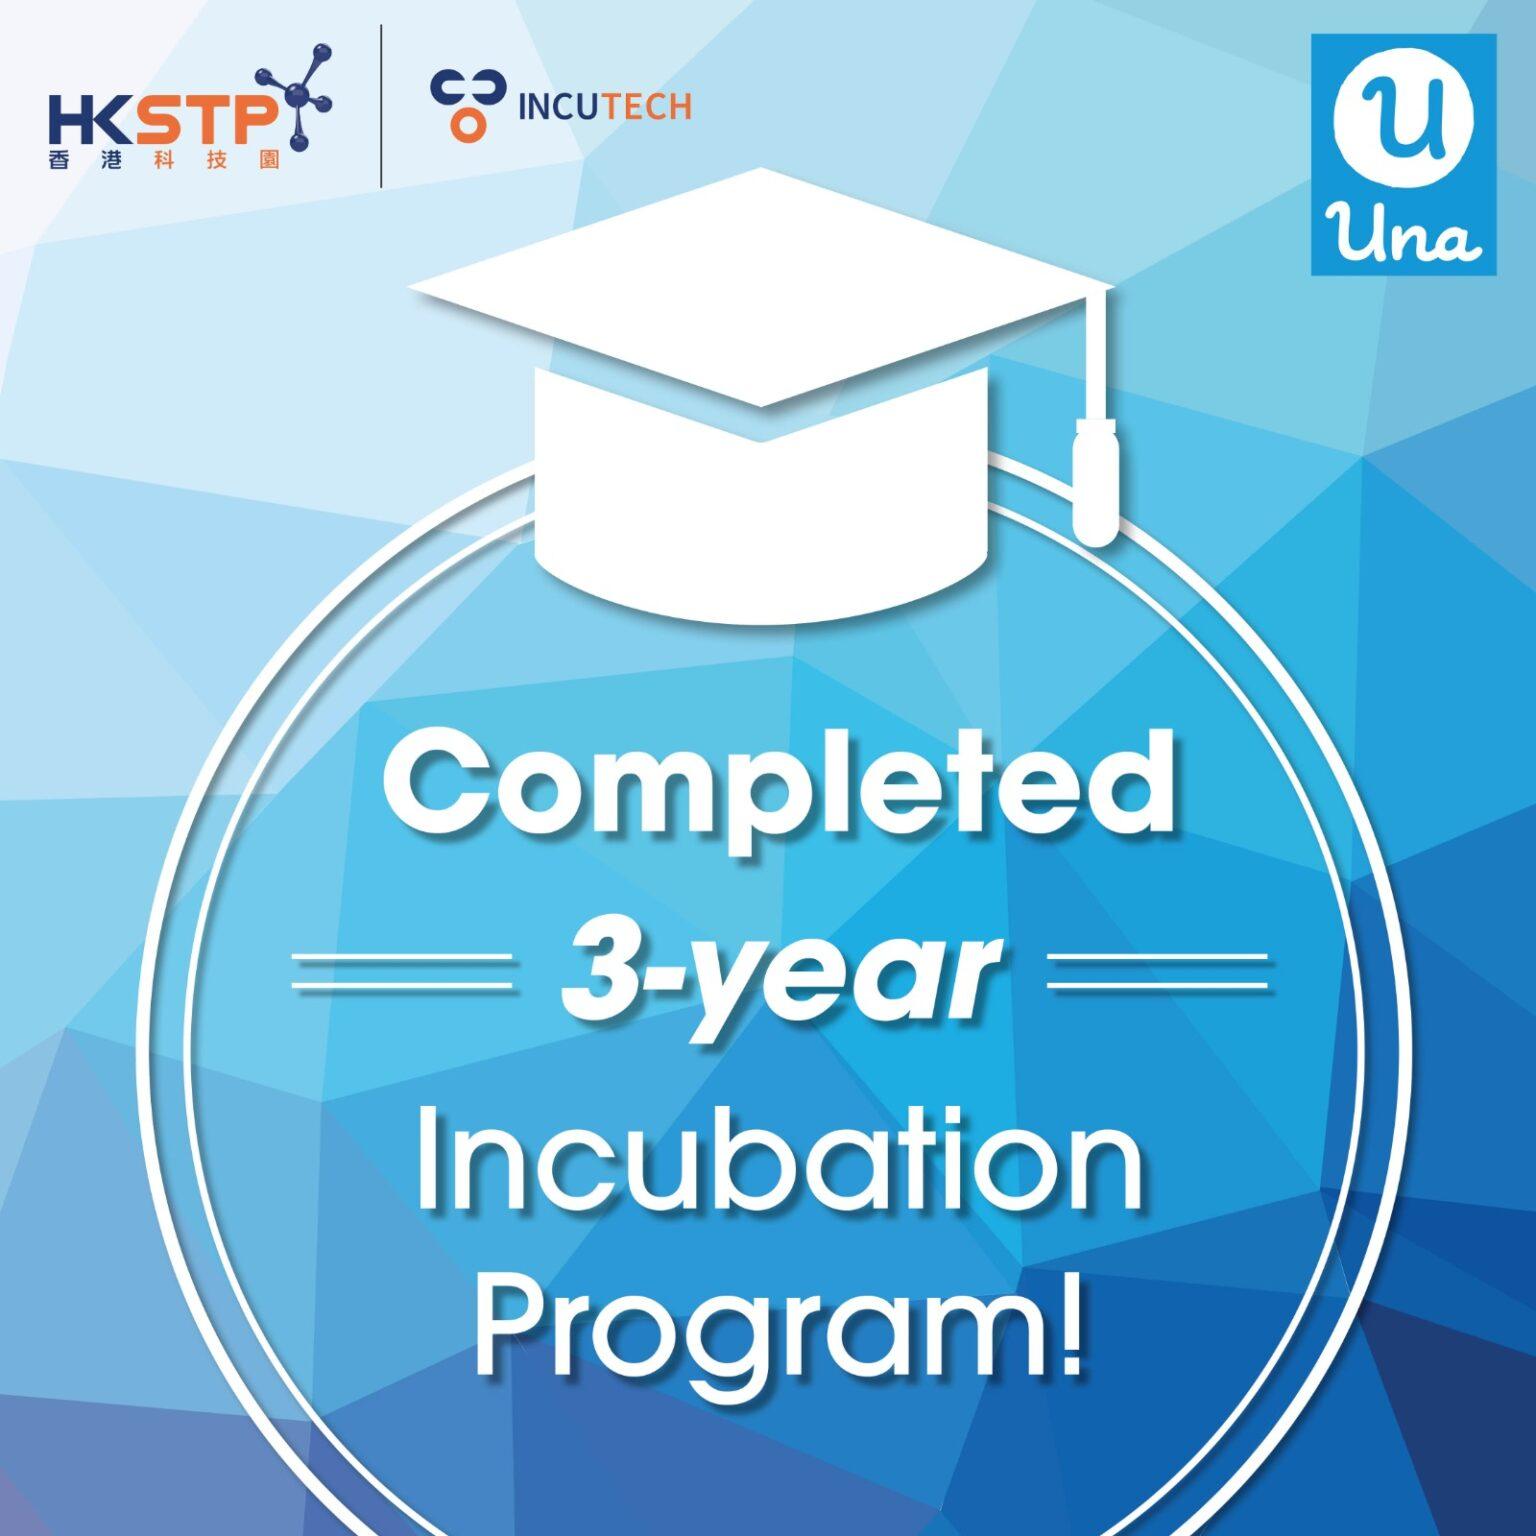 Una Milestone: Completed HKSTP's Incubation Program